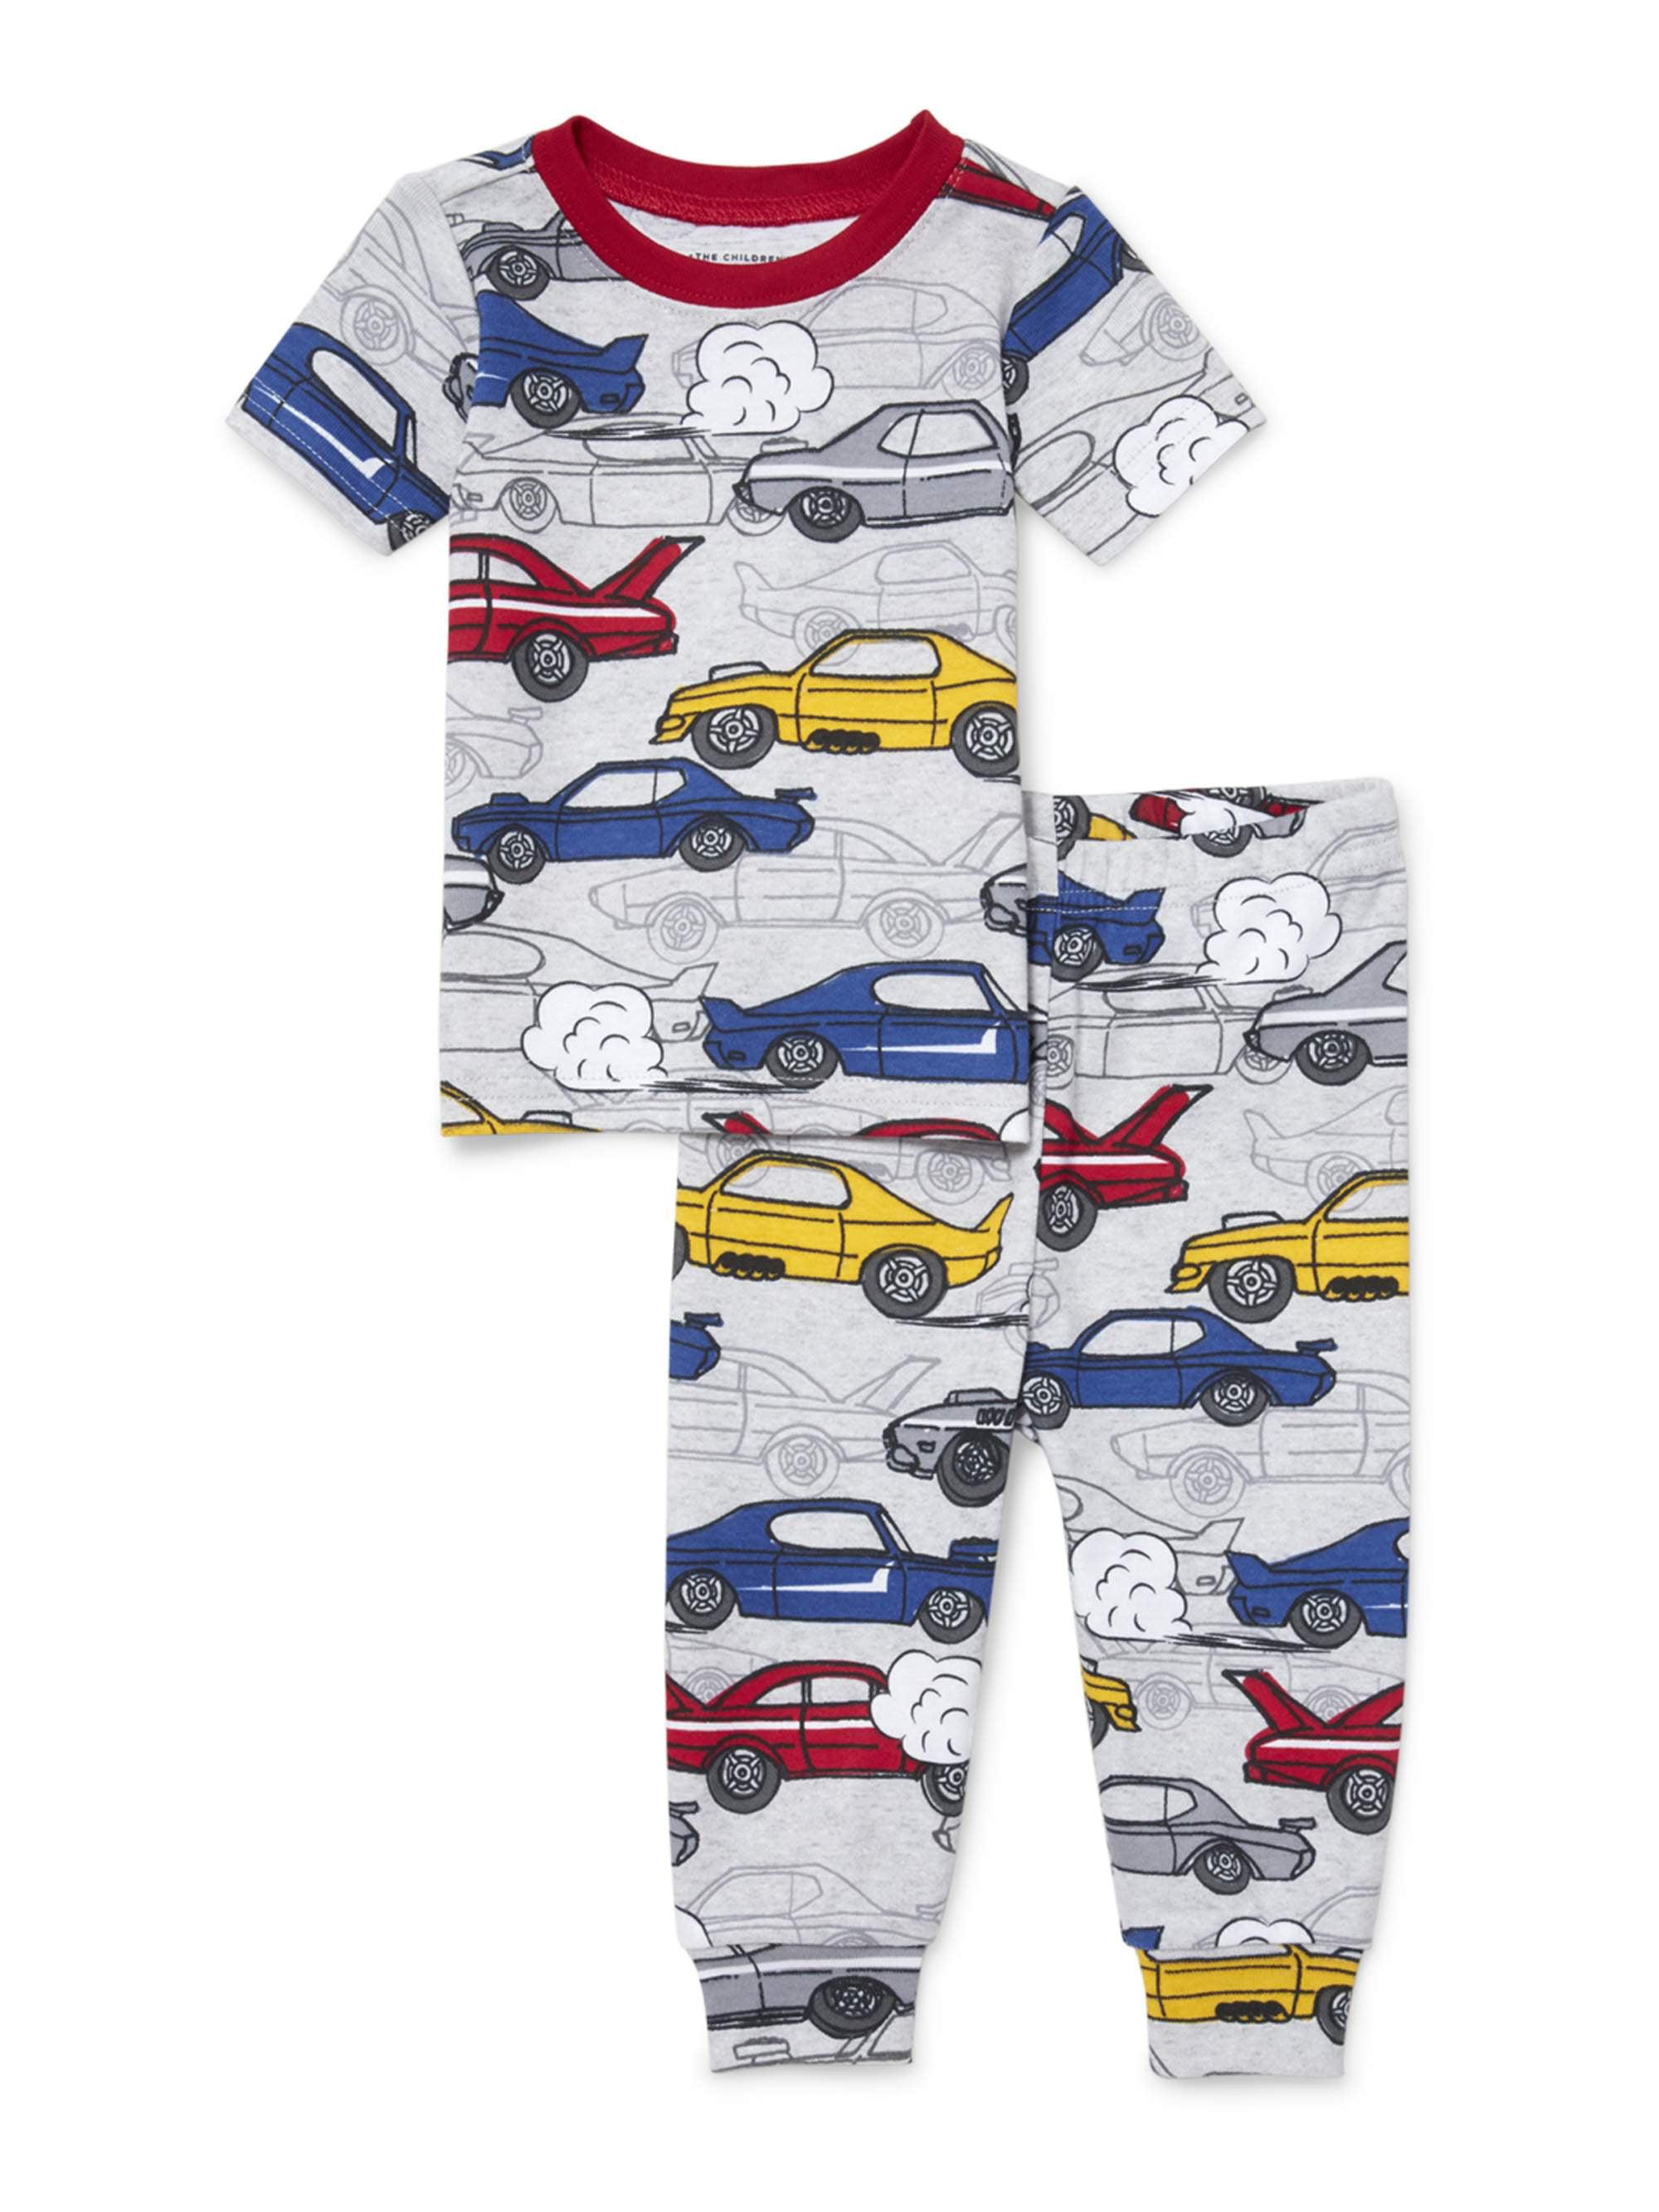 Baby And Toddler Boys Racecar Print Snug-Fit PJ Set (Baby and Toddler Boys)